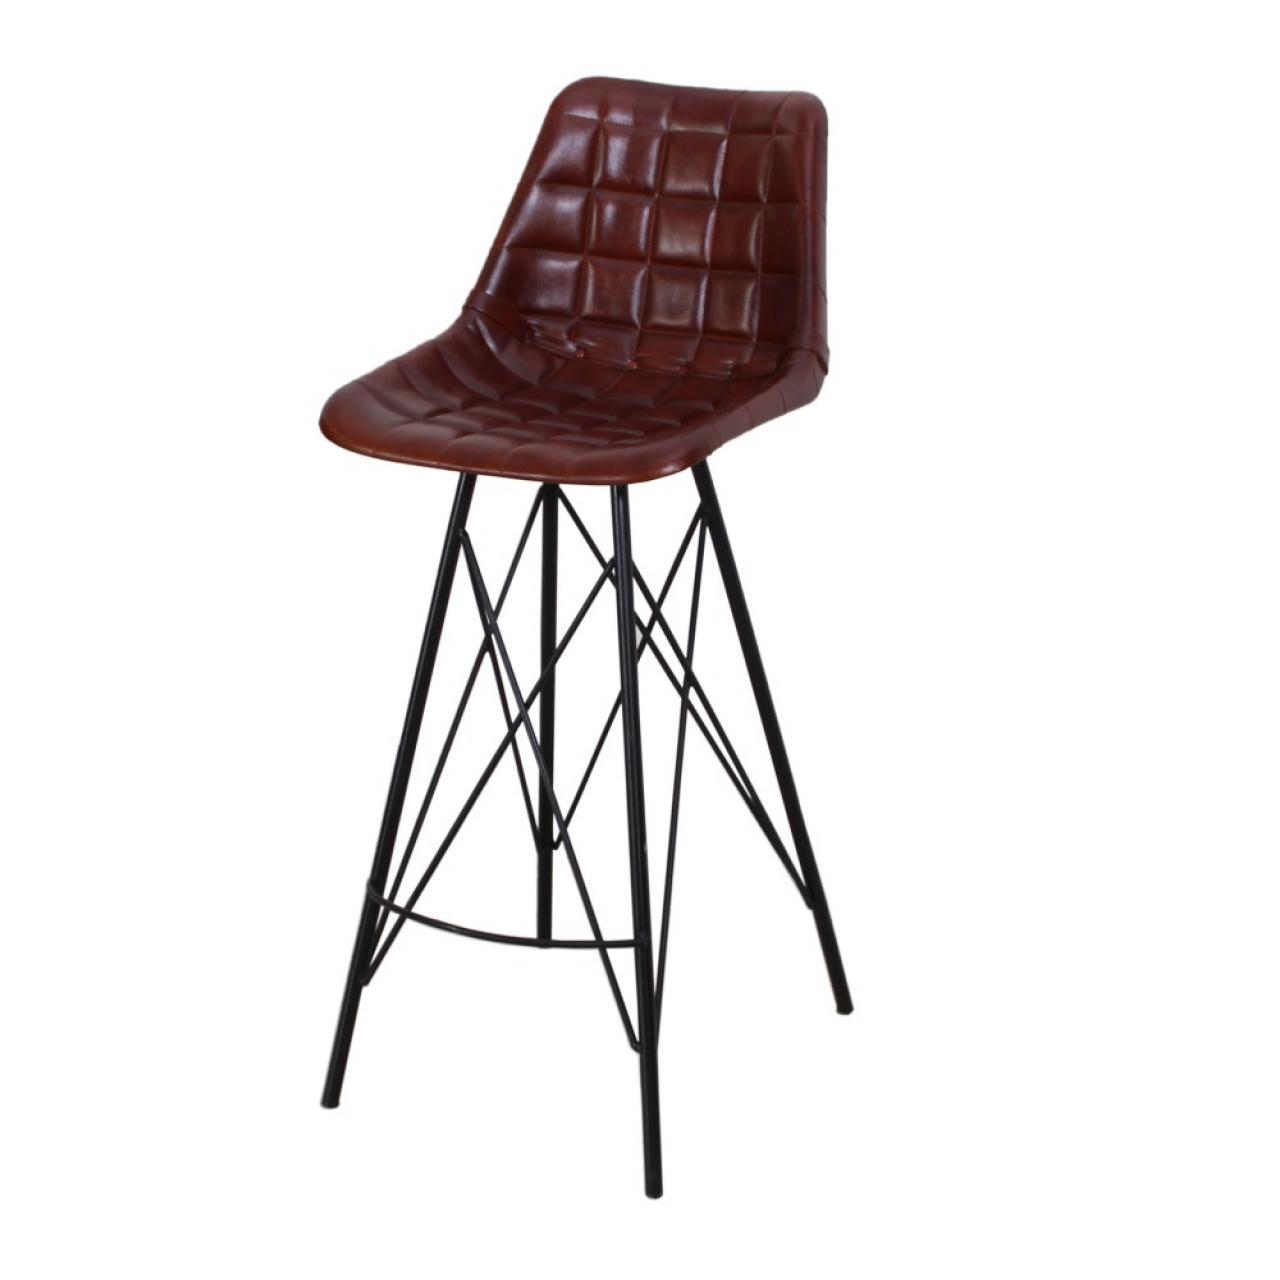 Barhocker - Sit&Chairs - dunkelbraun